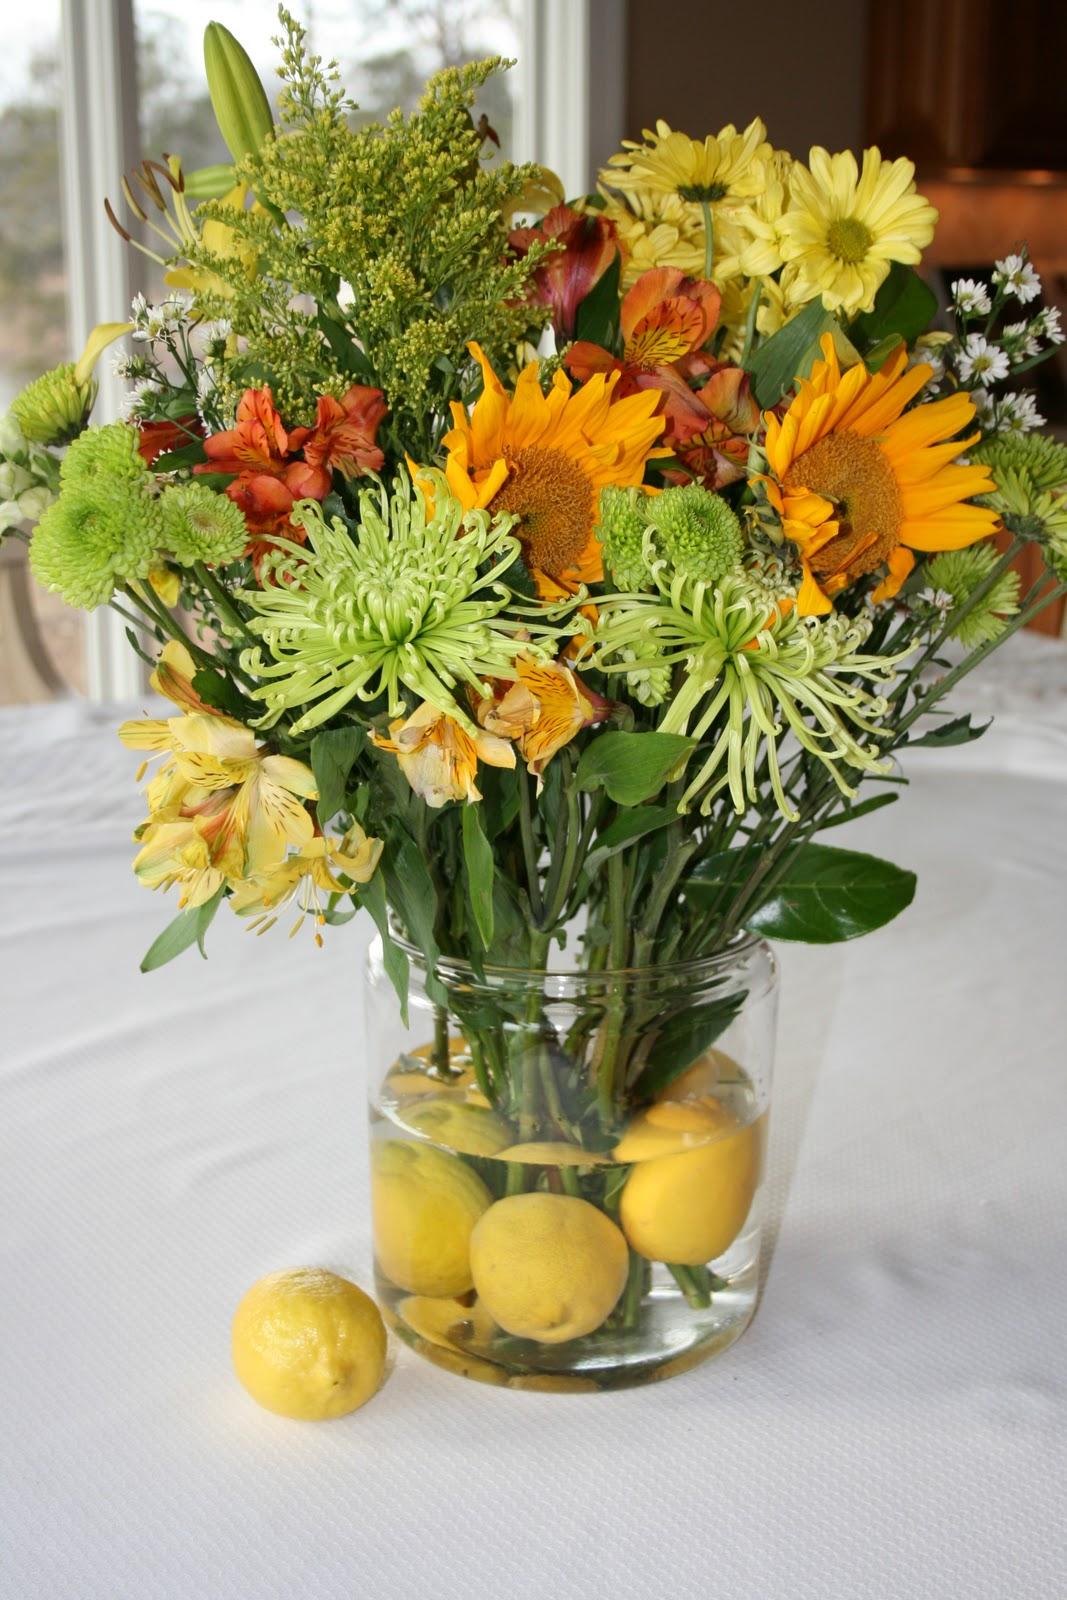 Everyday Entertaining: Flower Arrangements with Fruit ...